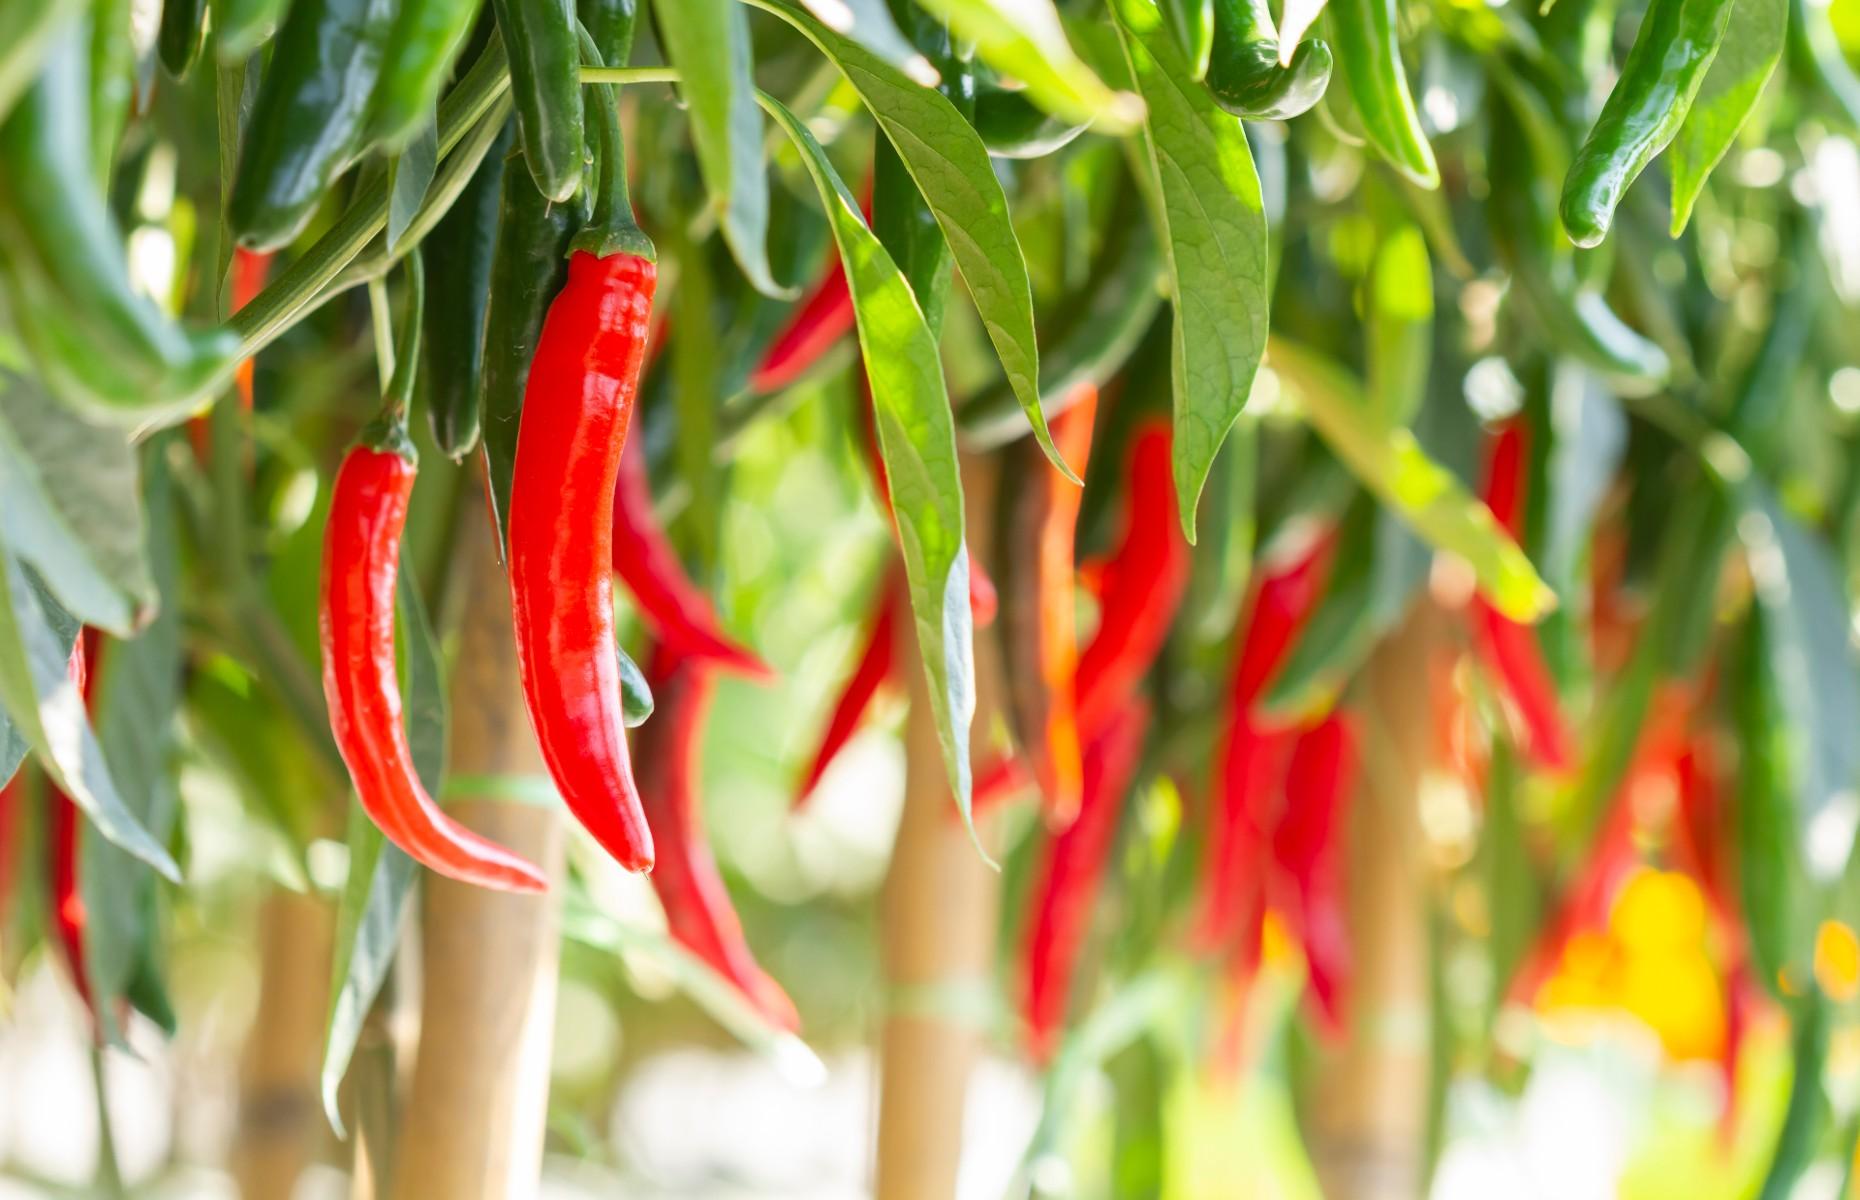 Chillies growing (Image: Worraket/Shutterstock)